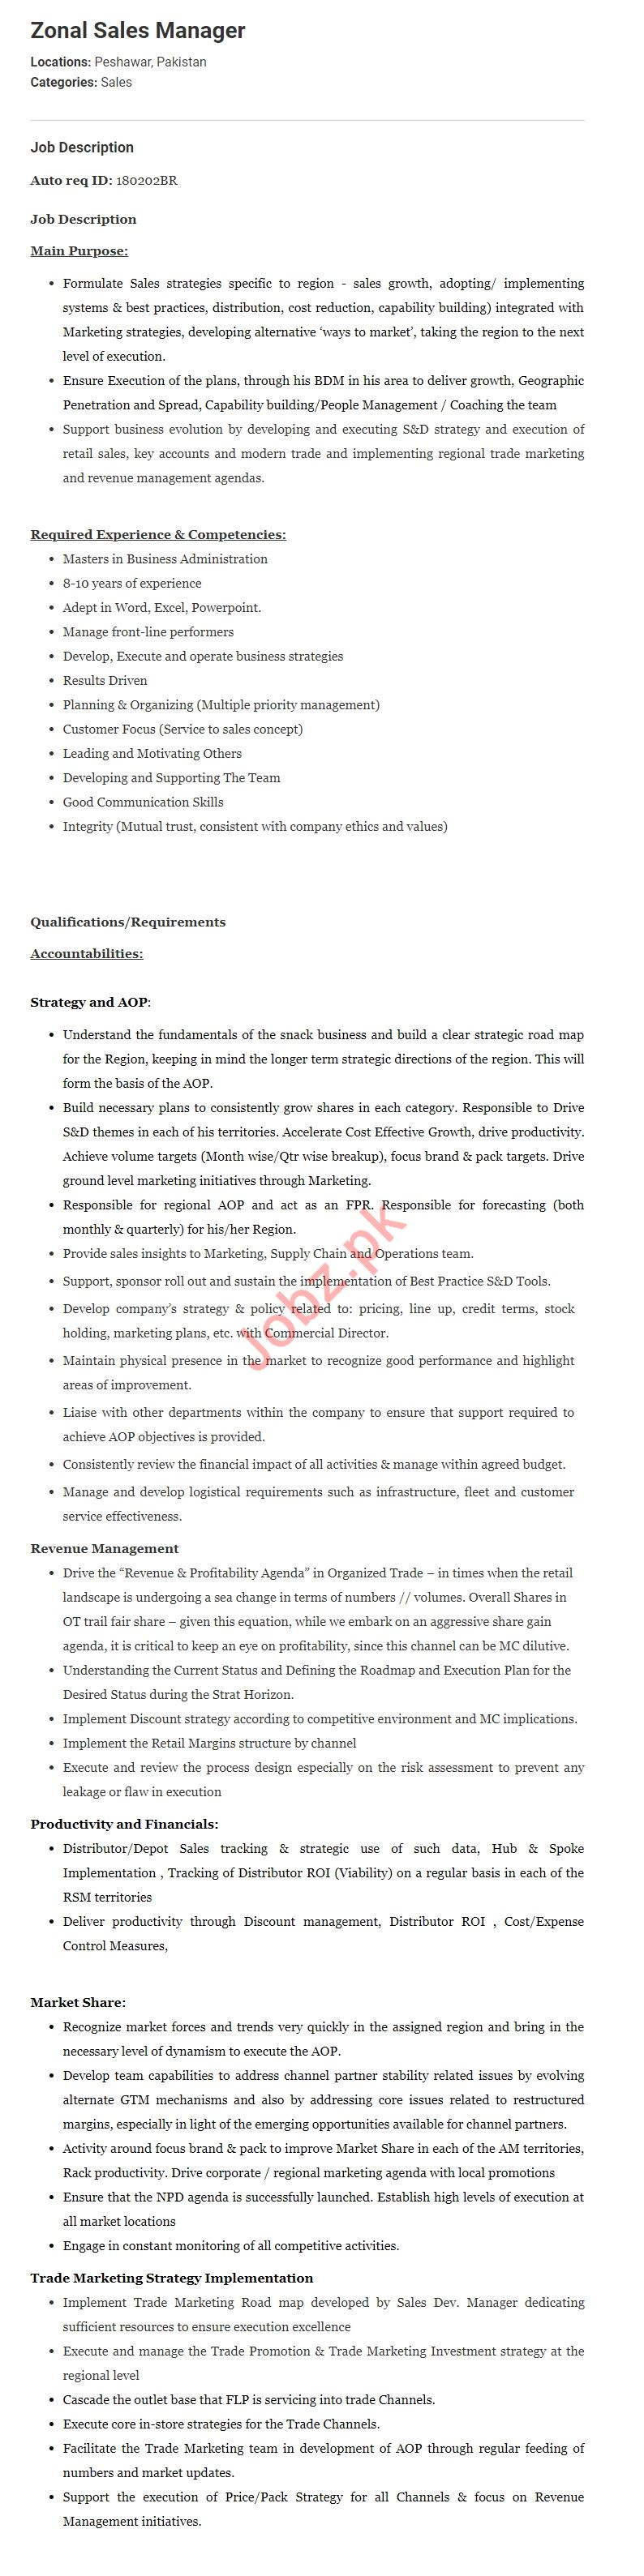 Zonal Sales Manager jobs in Pepsico 2019 Job Advertisement